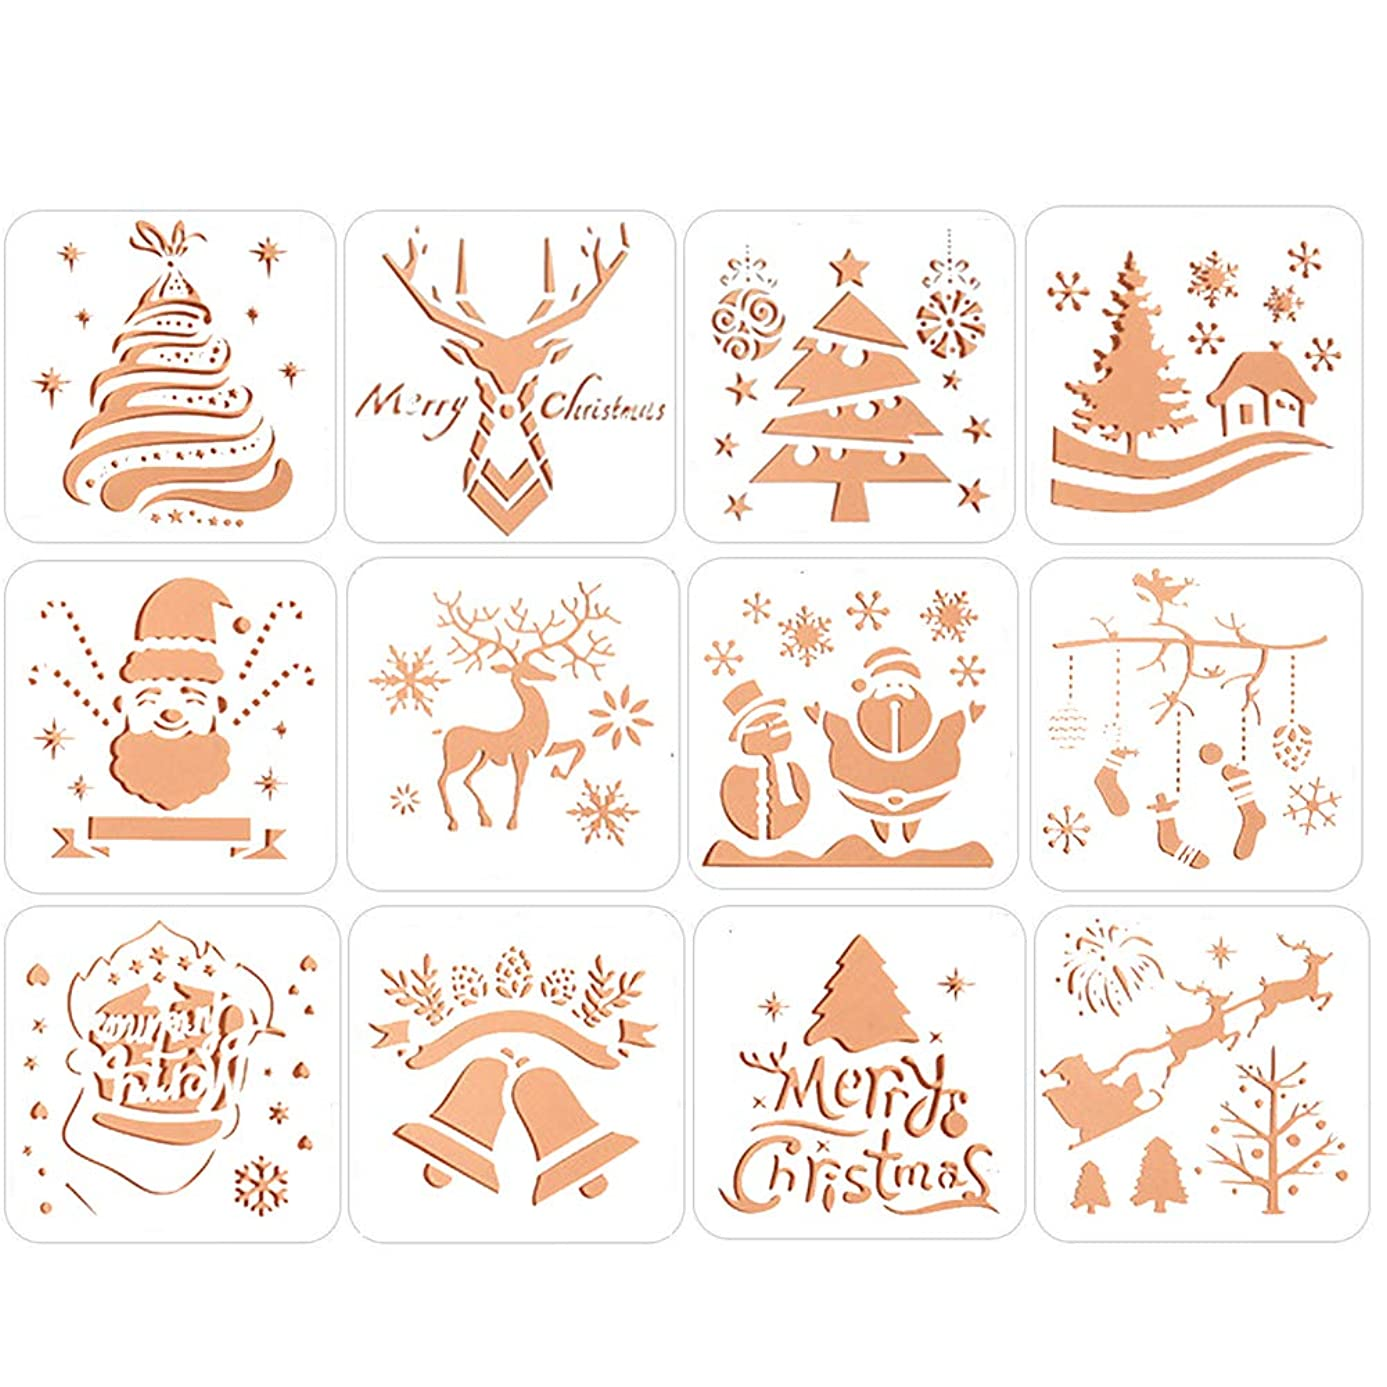 Christmas Painting Stencils Cute Christmas Trees Snowflake Jingle Bell Snowman Santa Claus Bullet Journal Stencil Spraying Templates for Christmas Card DIY Drawing Craft-12 pcs